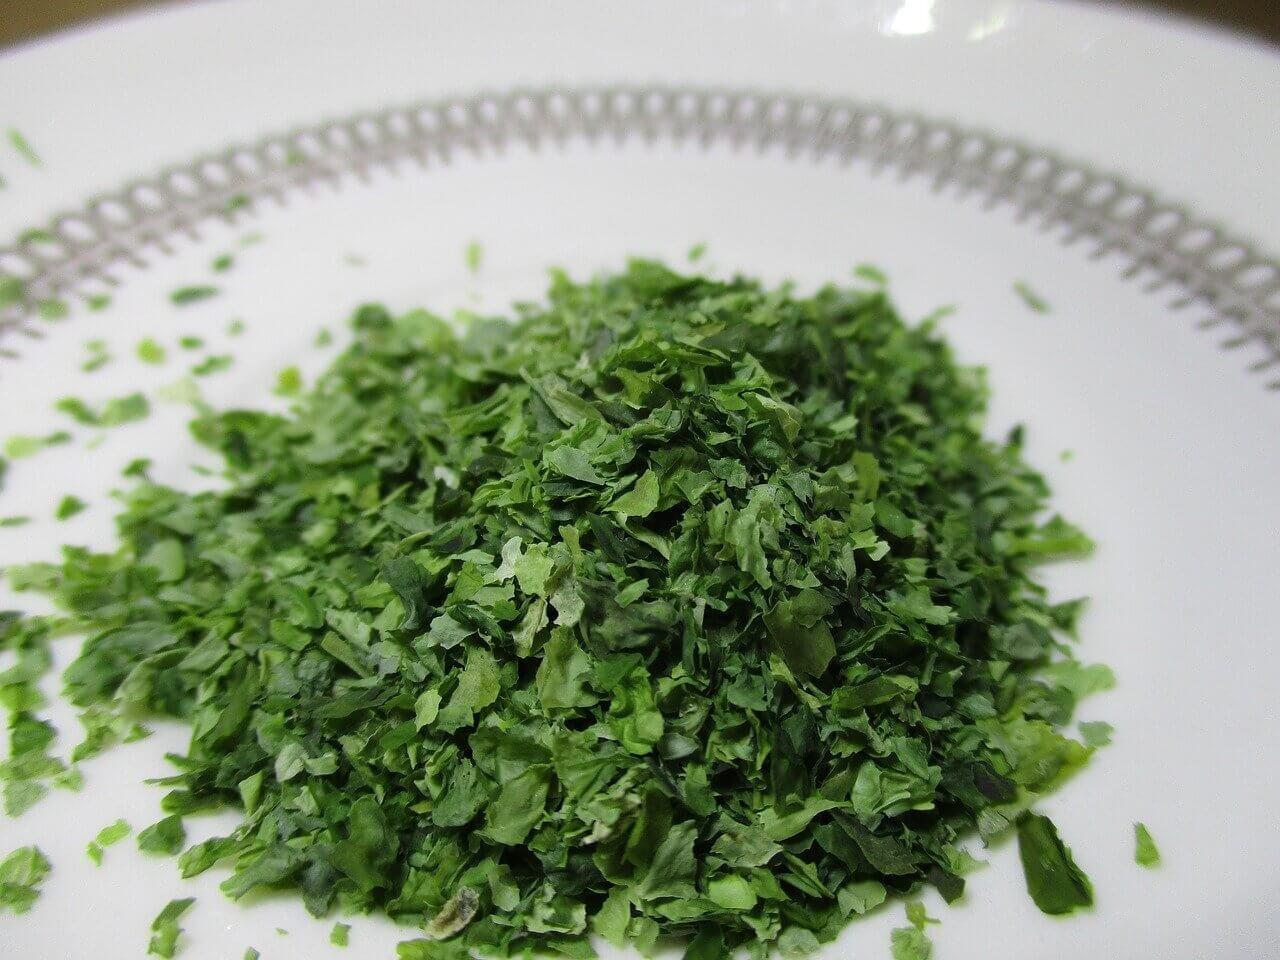 Healthy Superfood Nori Seaweed Flakes